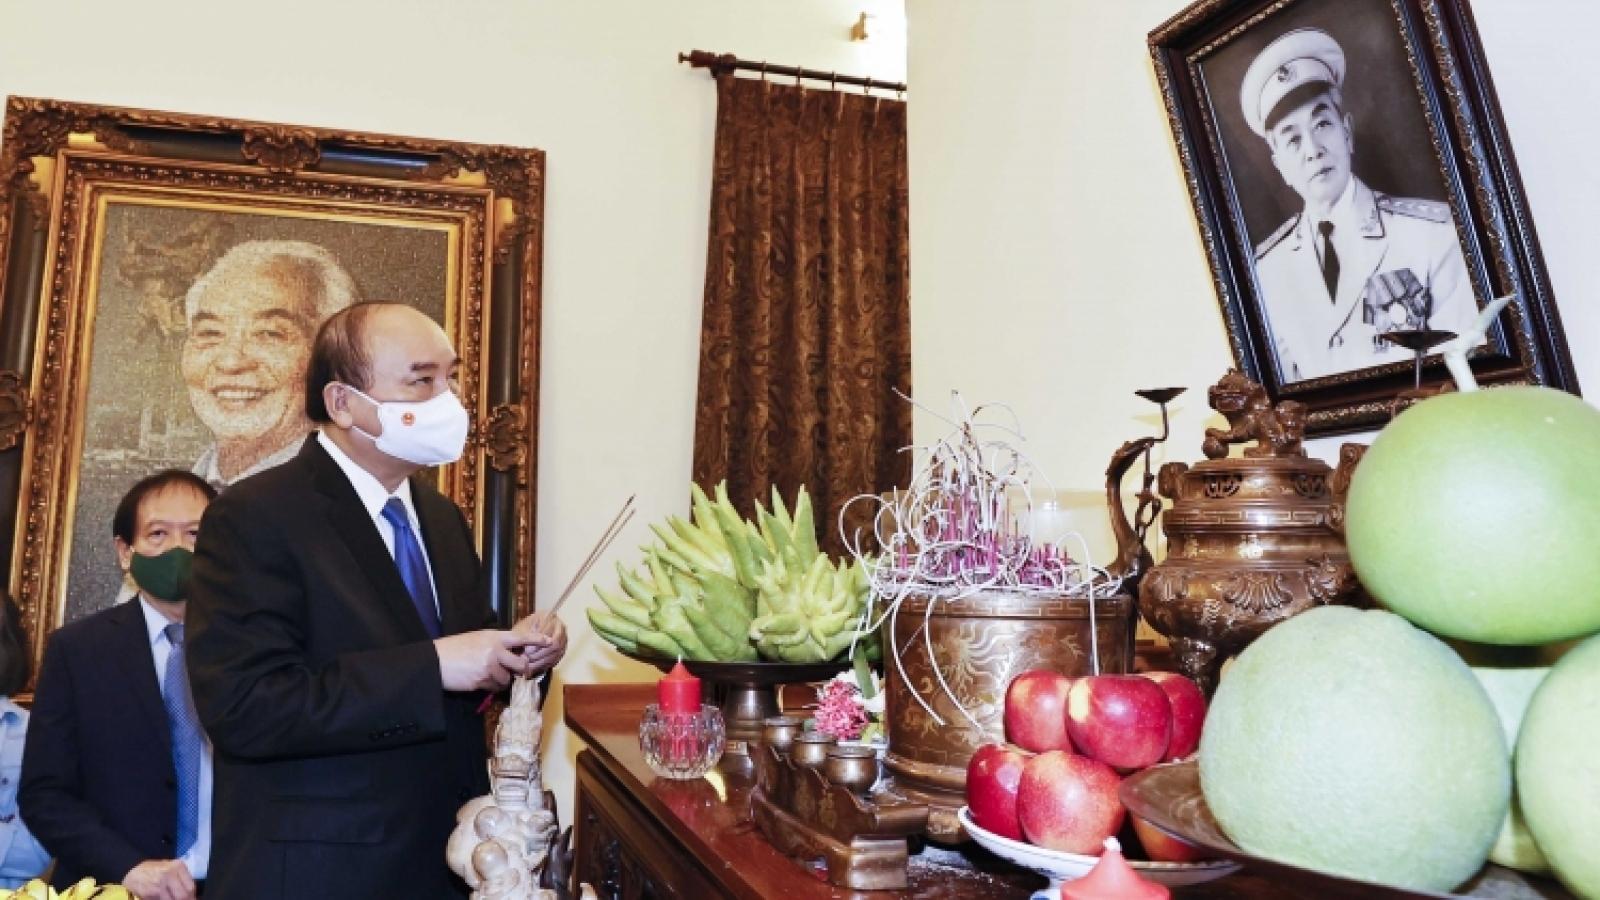 State President commemorates legendary General Vo Nguyen Giap